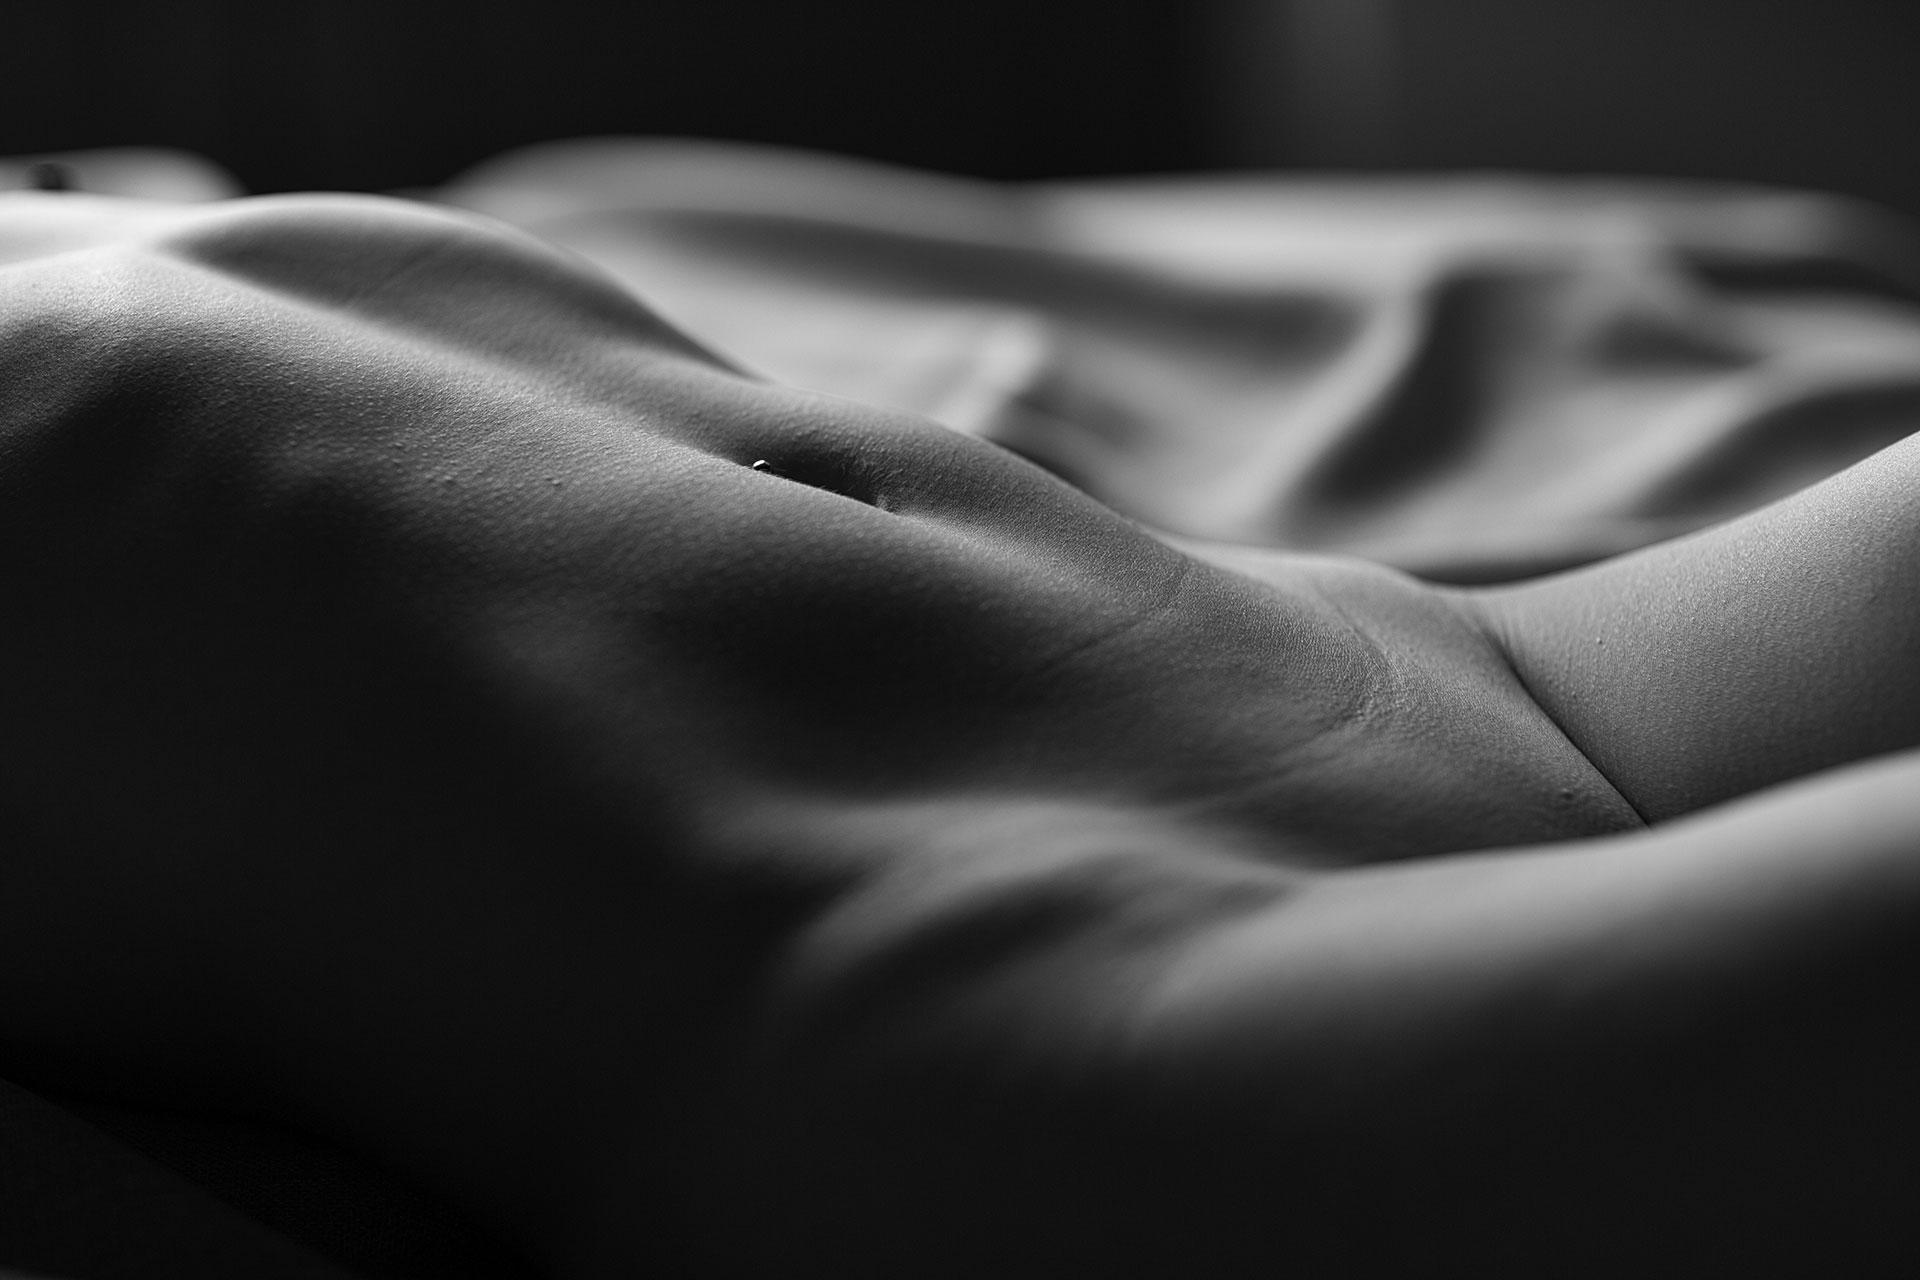 © - Alexandre Cicconi